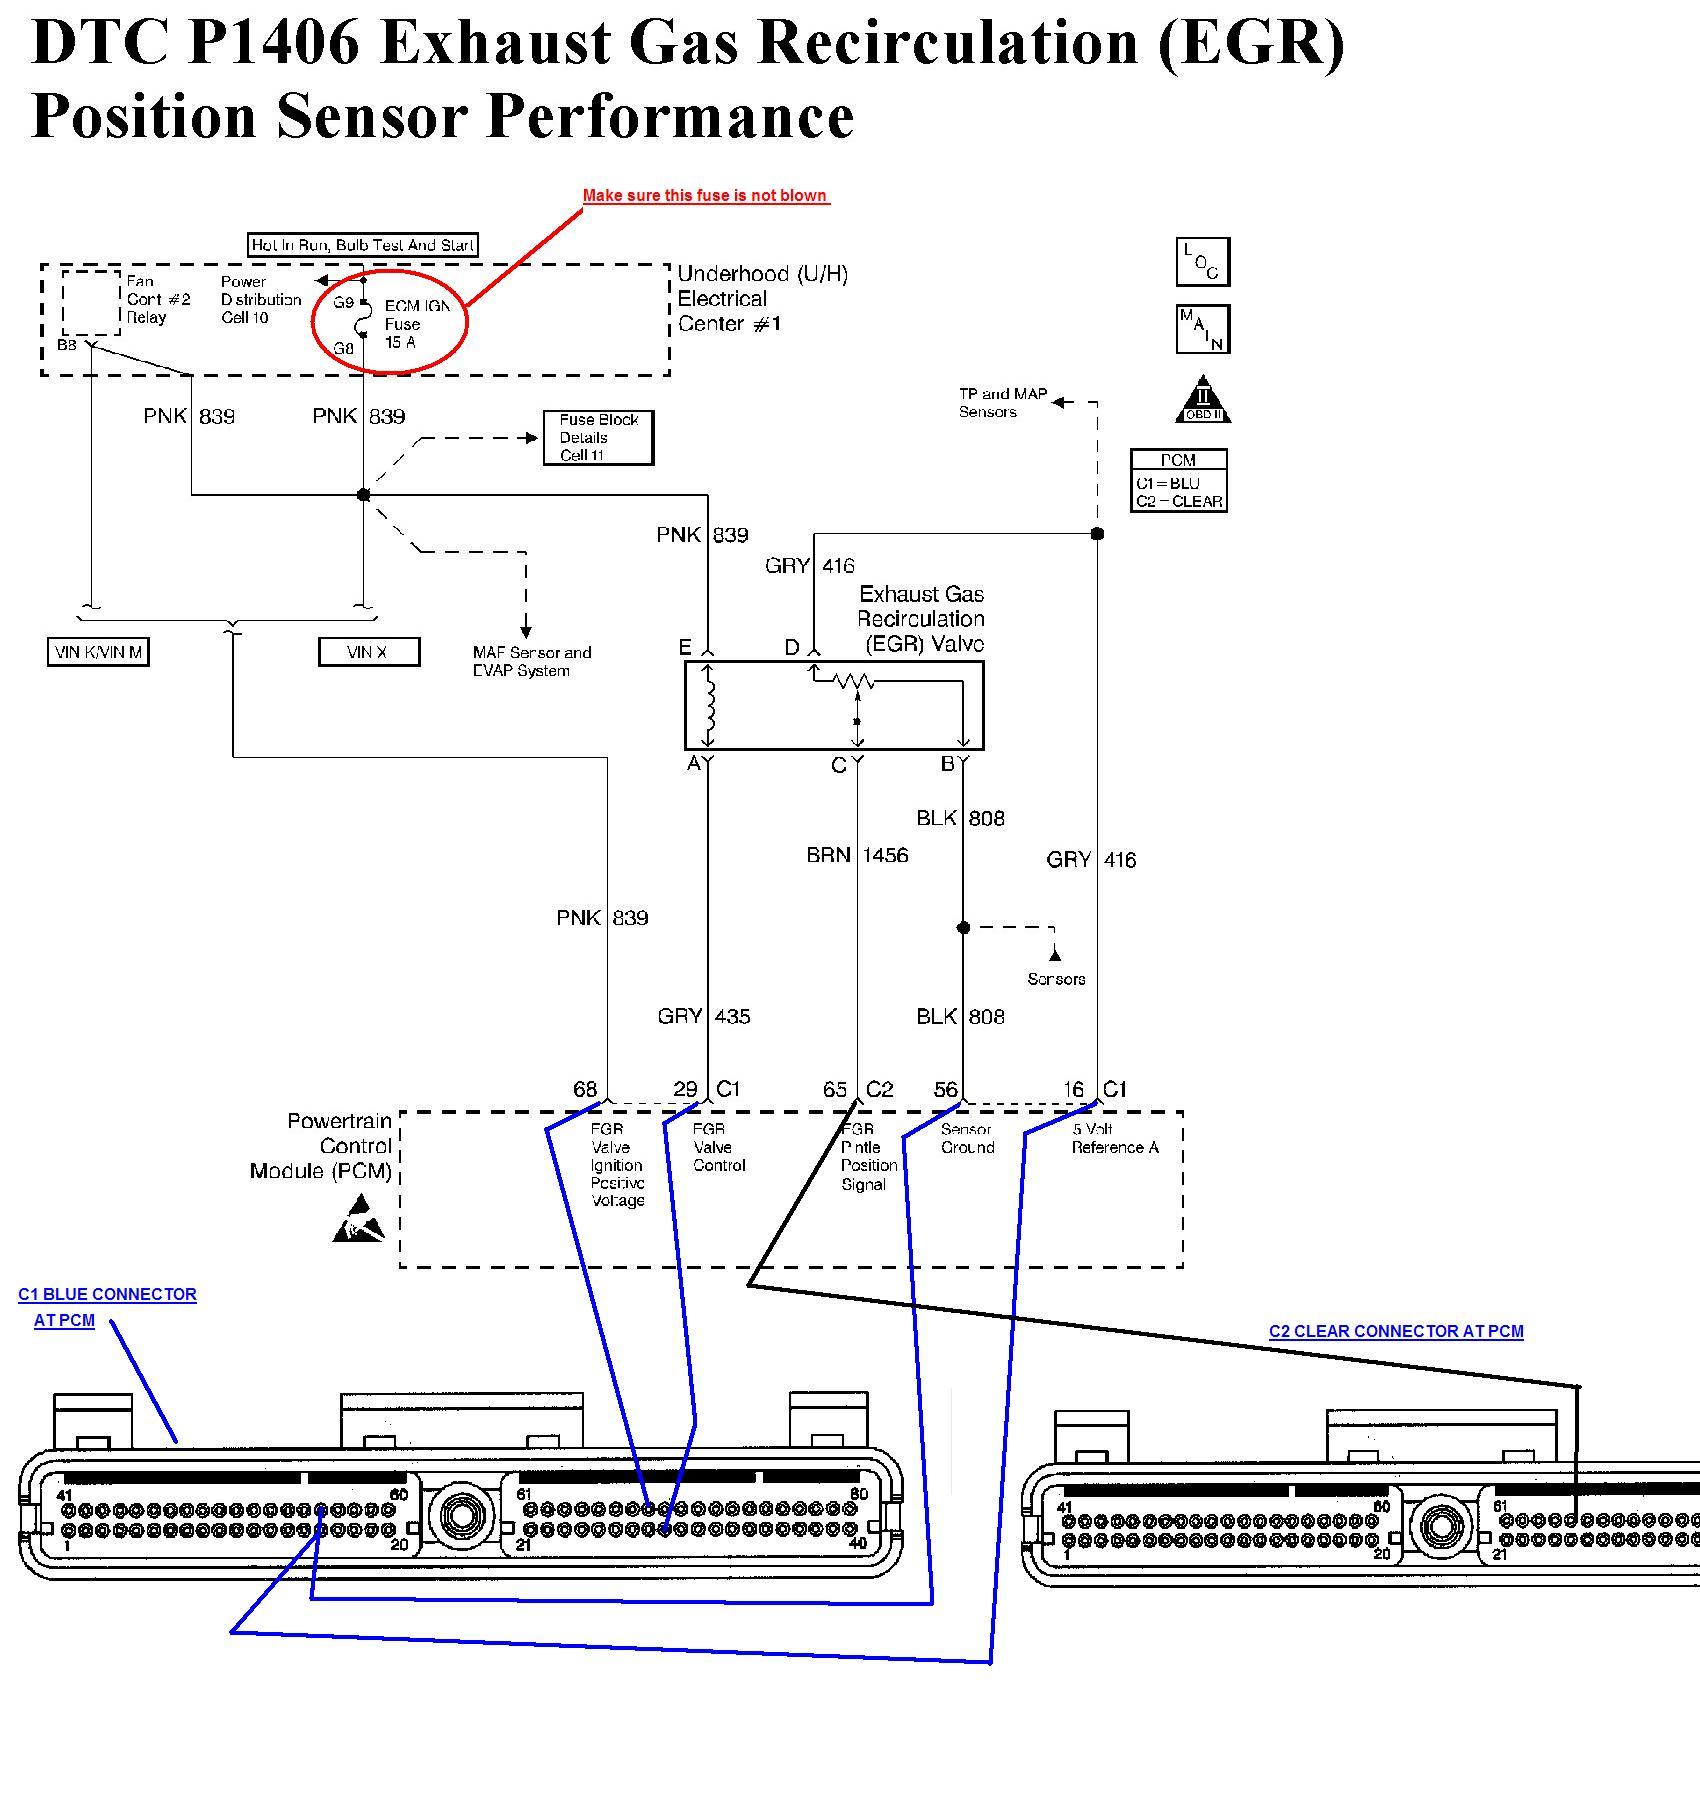 2000 chevy s10 alternator wiring diagram 92 lumina wiring diagram: i have a  1996 chevy lumina 129,000  dont want